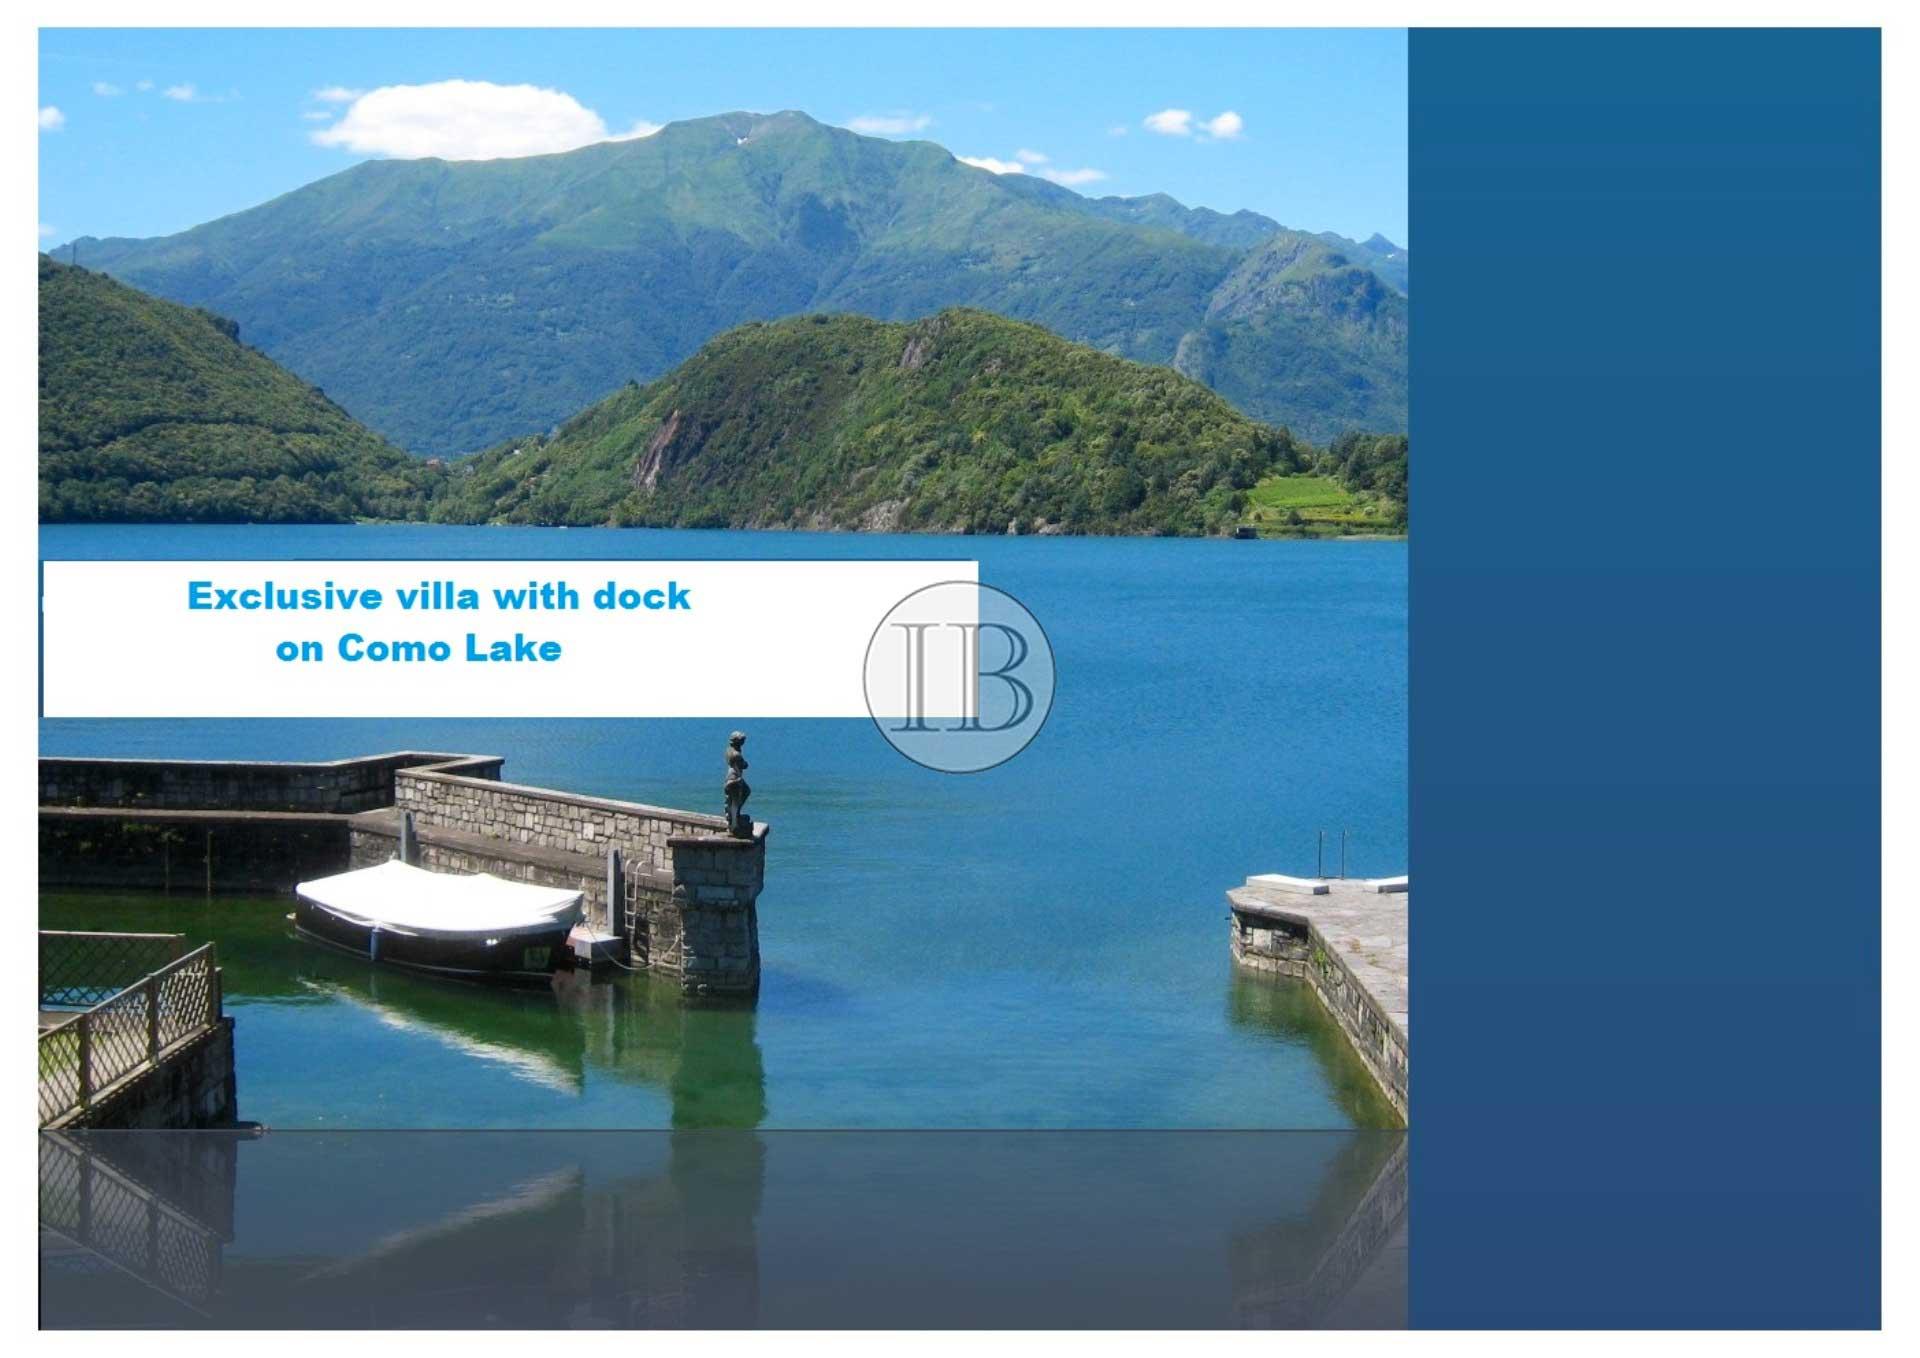 Exclusive villa with dock on Como Lake